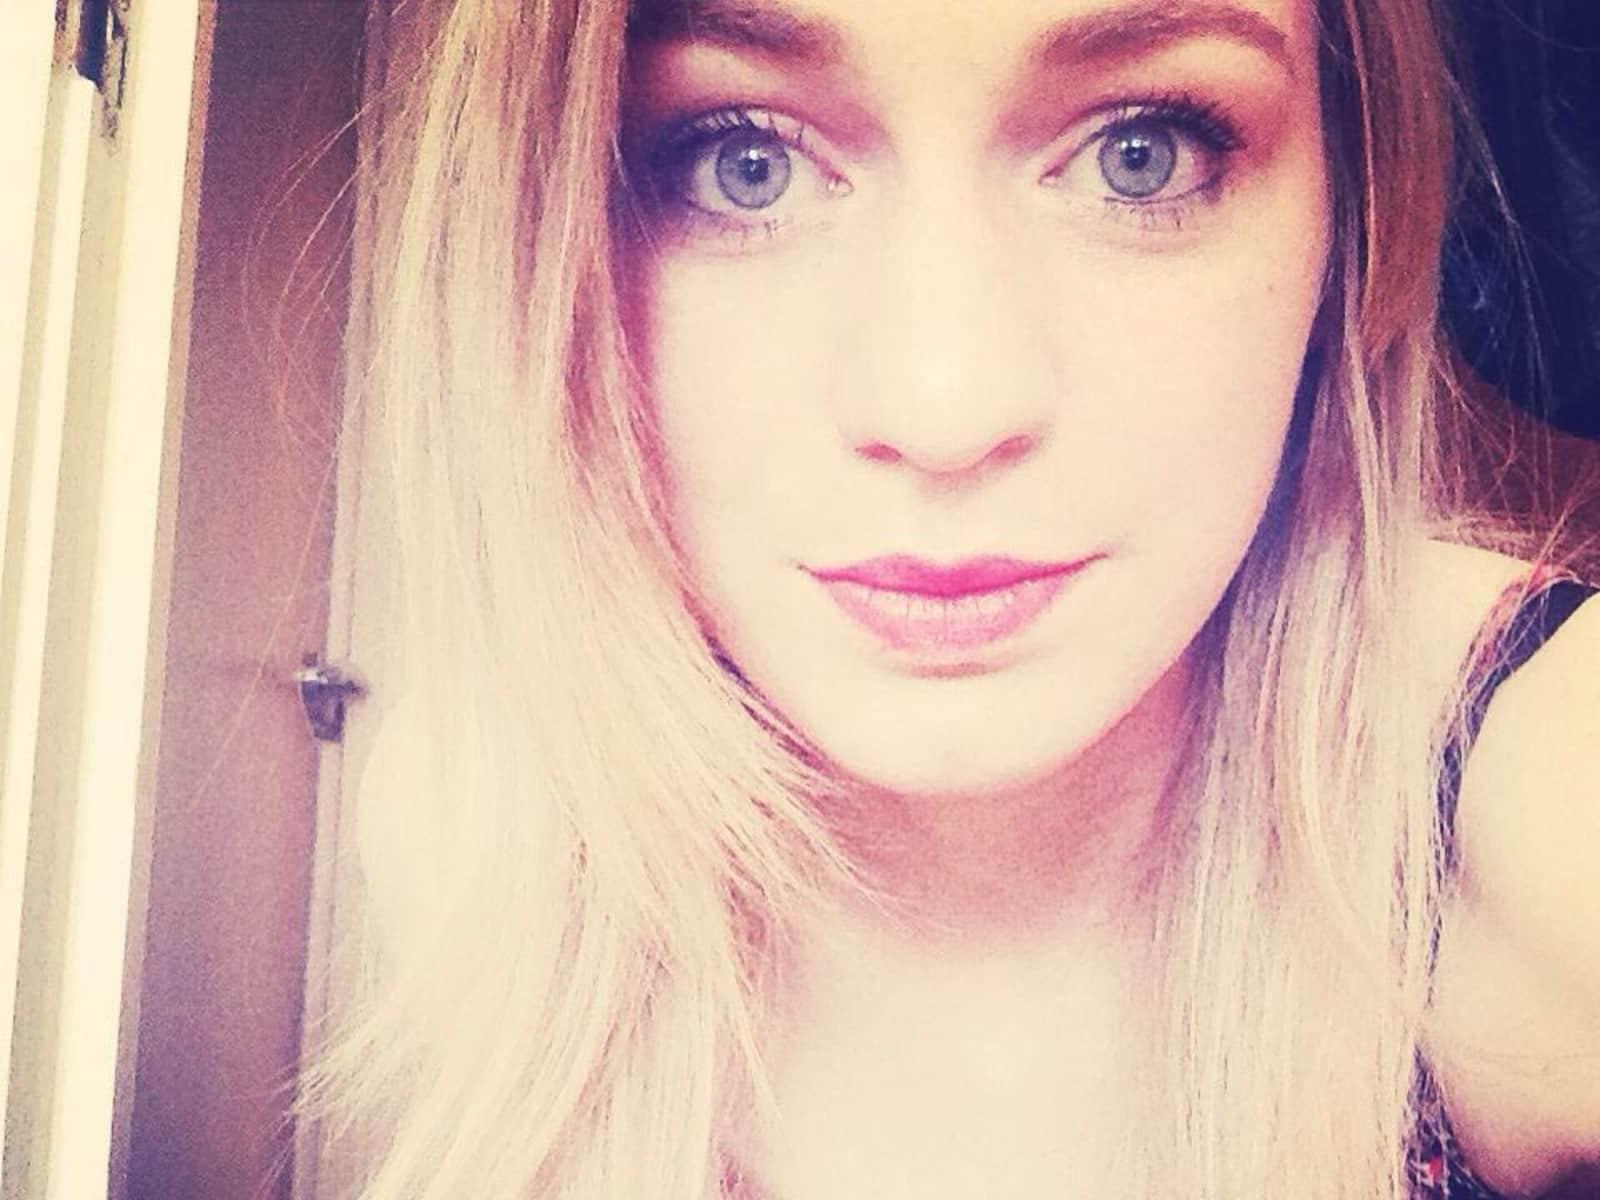 Alessandra from Neuwied, Germany